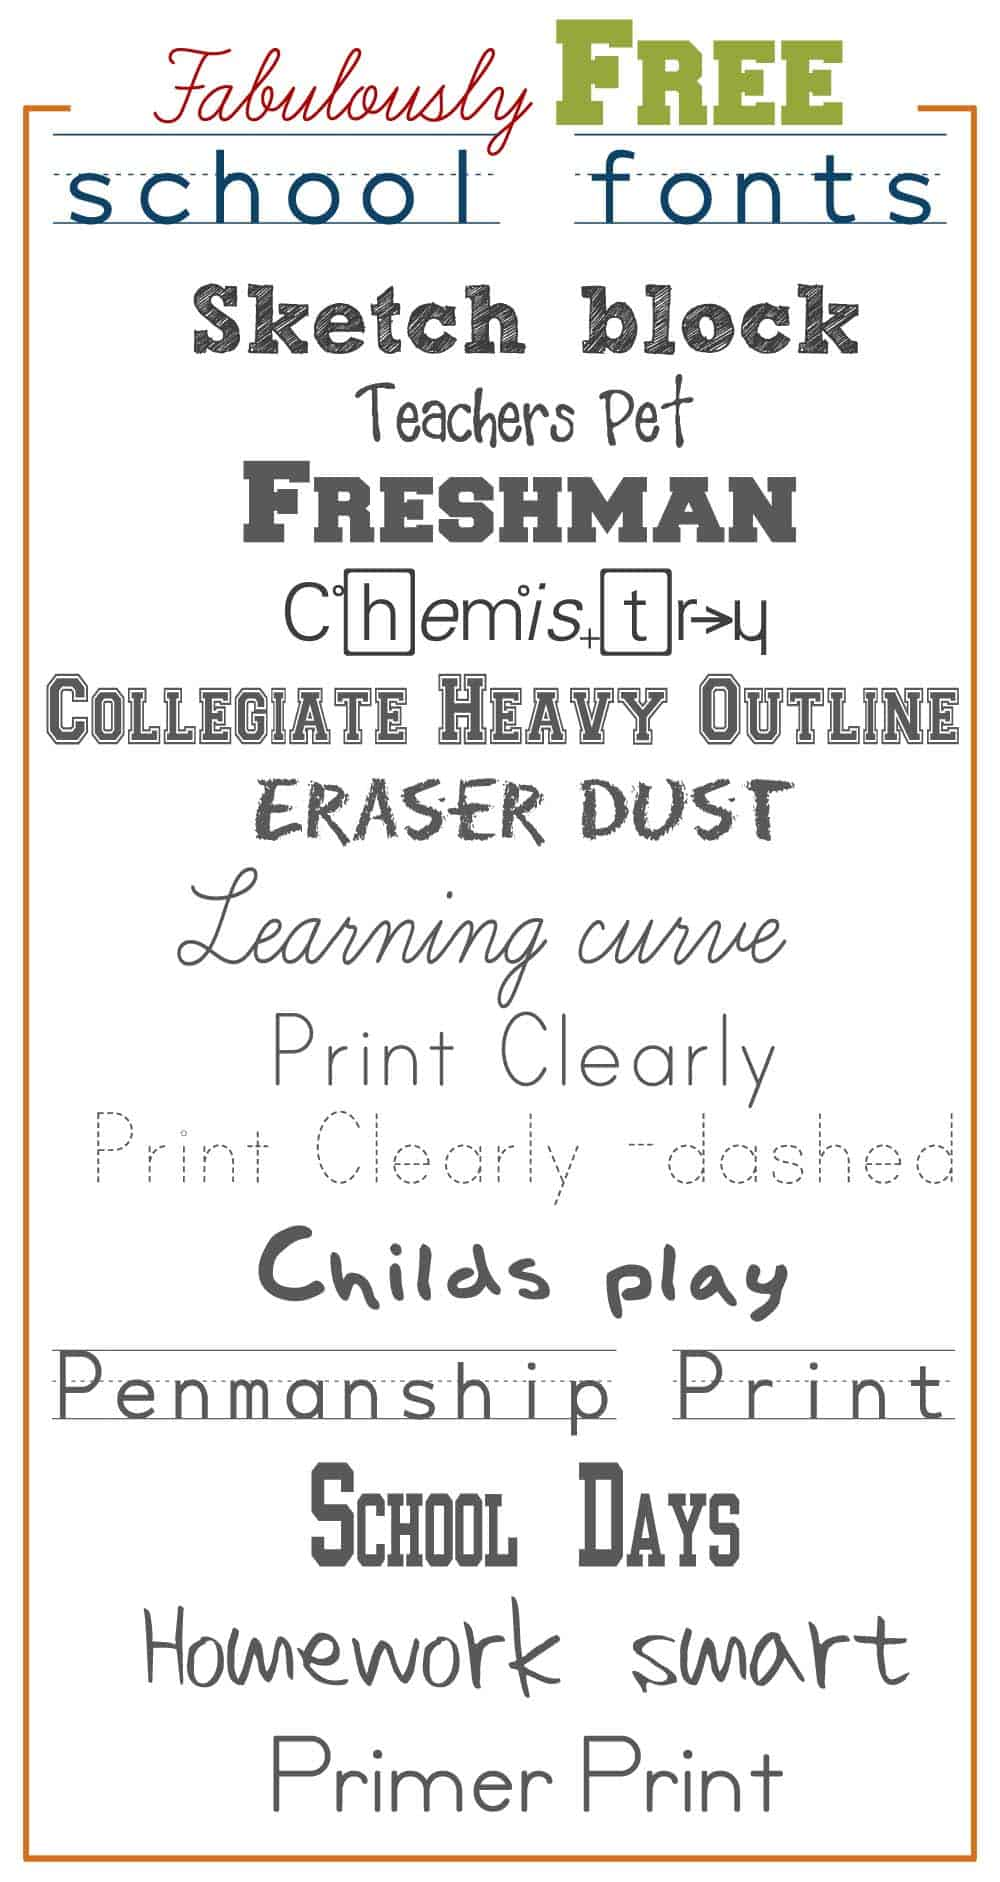 Download Fabulously Free School Fonts